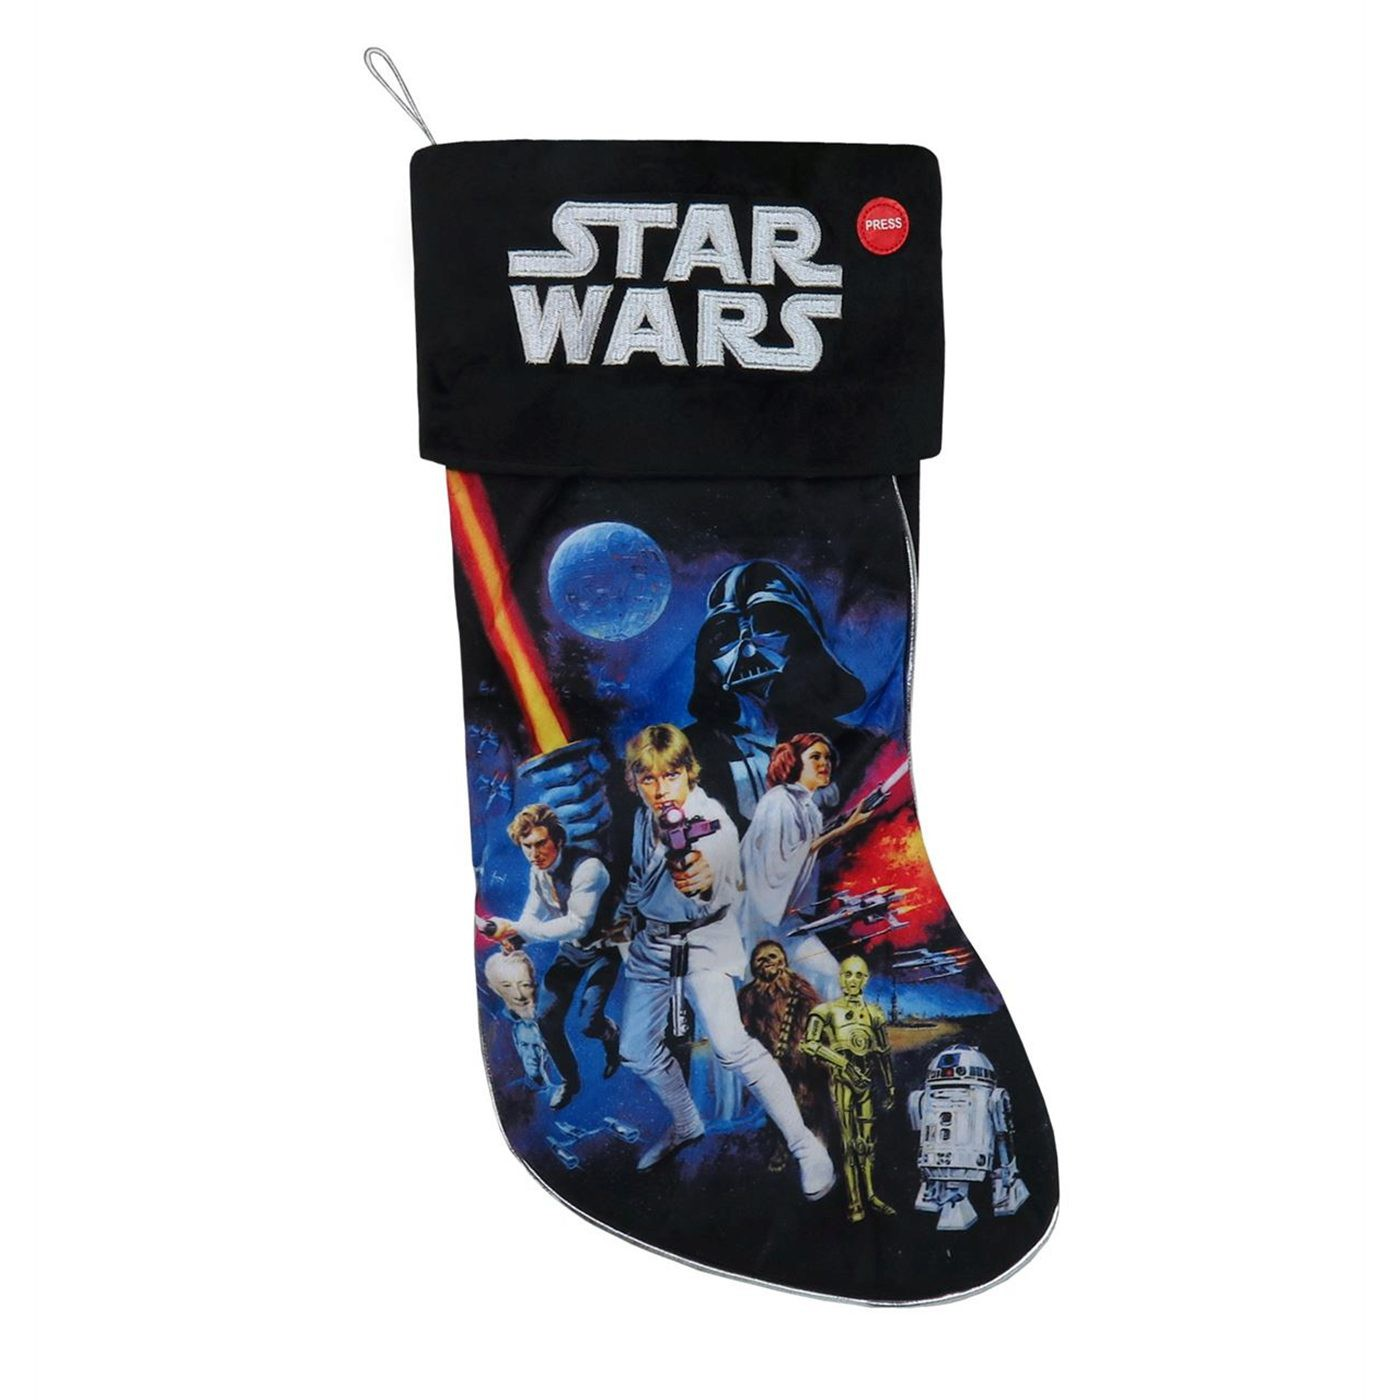 Star Wars Light-Up Christmas Stocking